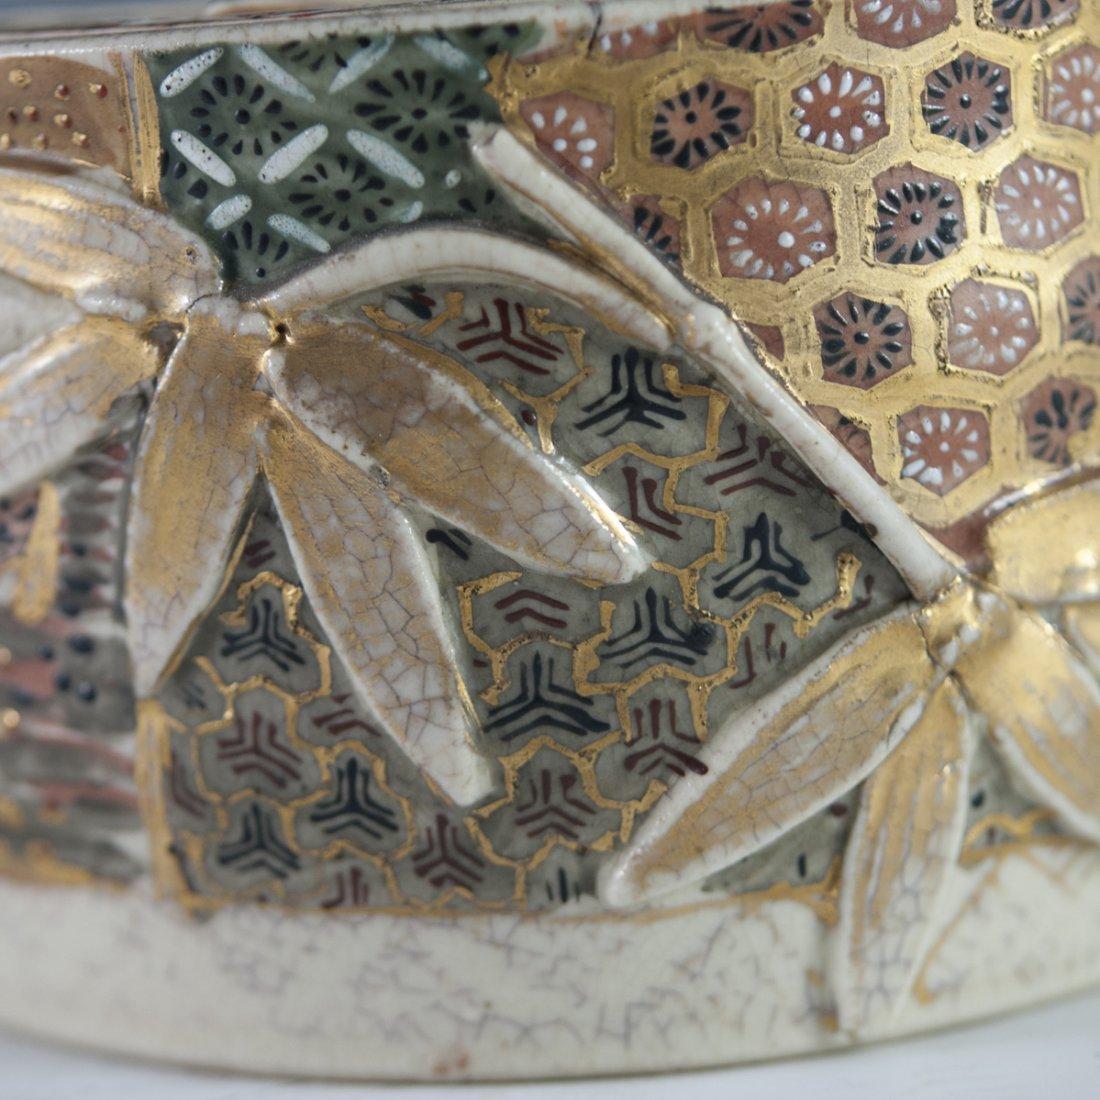 Antique Japanese Satsuma Porcelain Box - 6